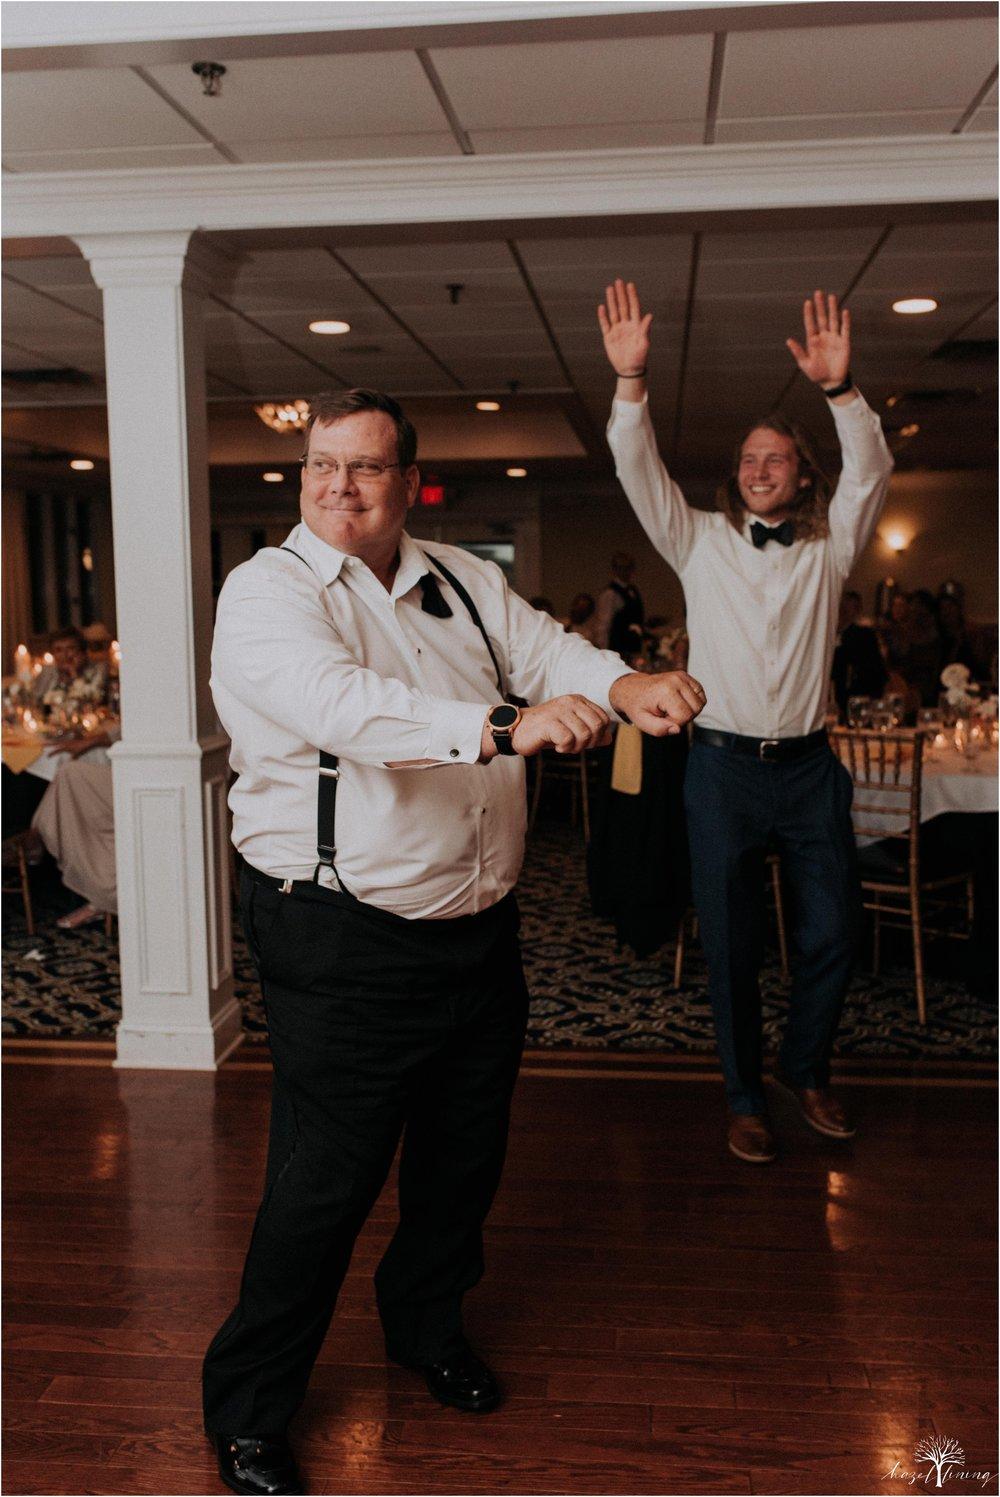 elizabeth-doelp-andrew-foreback-middletown-country-club-summer-langhorne-pennsylvania-wedding-hazel-lining-travel-wedding-elopement-photography_0151.jpg